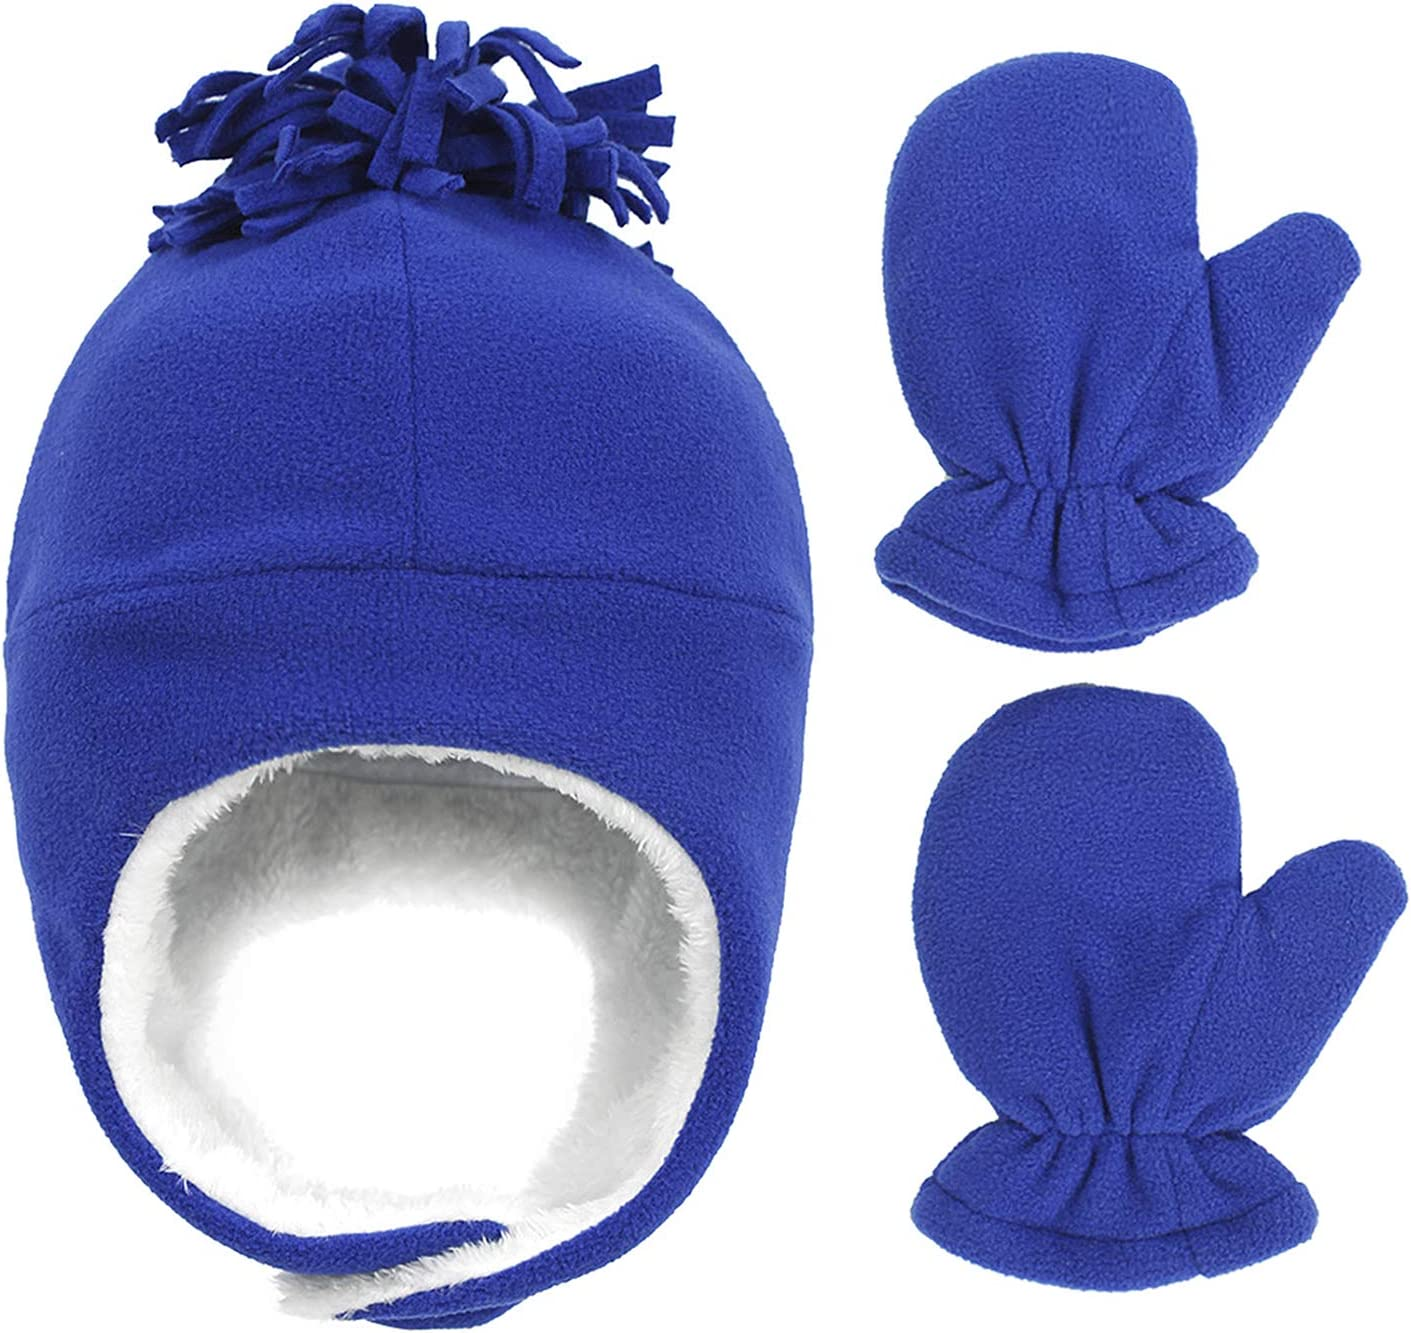 Kids Children Knitted Hat Gloves Set Winter Warm Thick Fleece Plush Lining Ski Cap Adjustable Outdoor Sport Windproof Ushanka Beanie Hat Pilot Hat with Mitten Gloves for Boys Girls